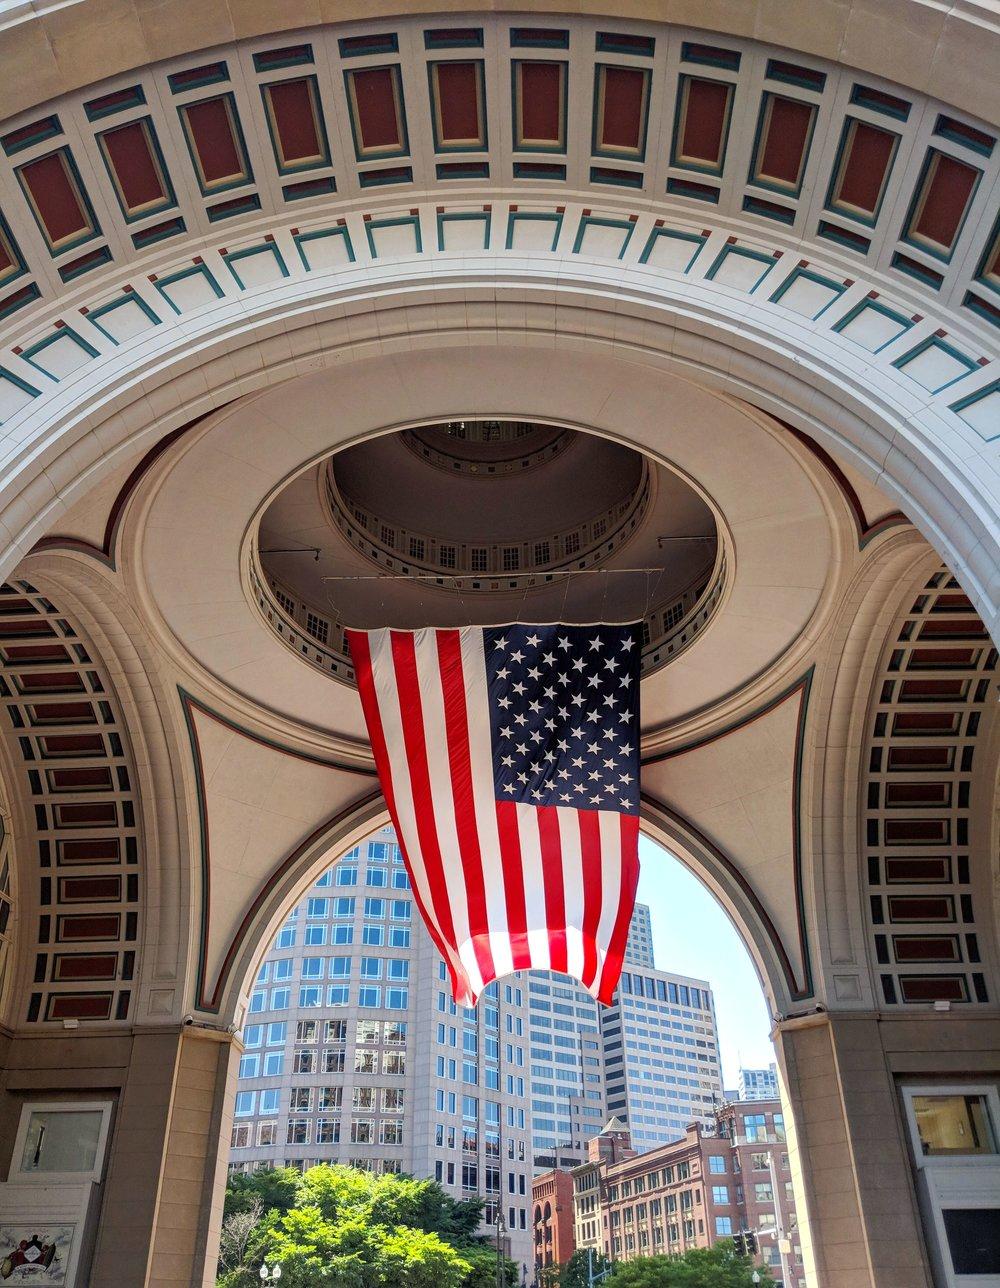 bri rinehart; photography; american flag; boston; rowes wharf